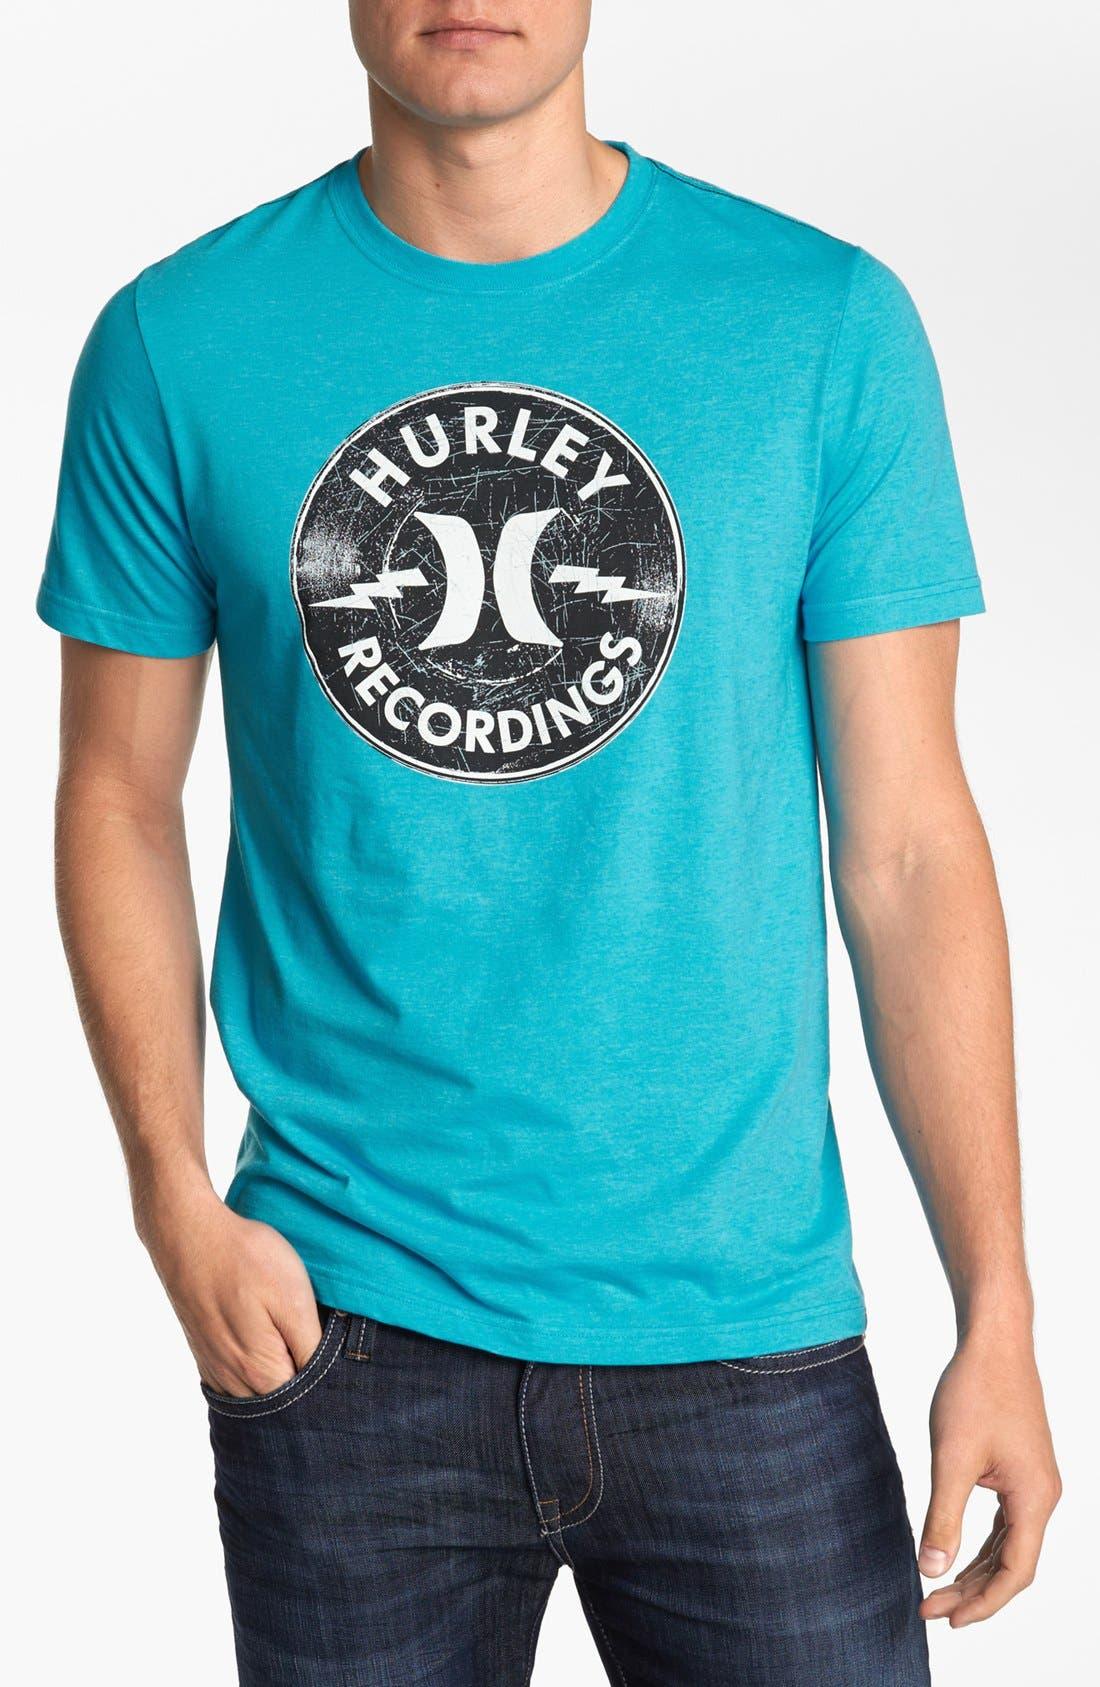 Main Image - Hurley 'Recordings' T-Shirt